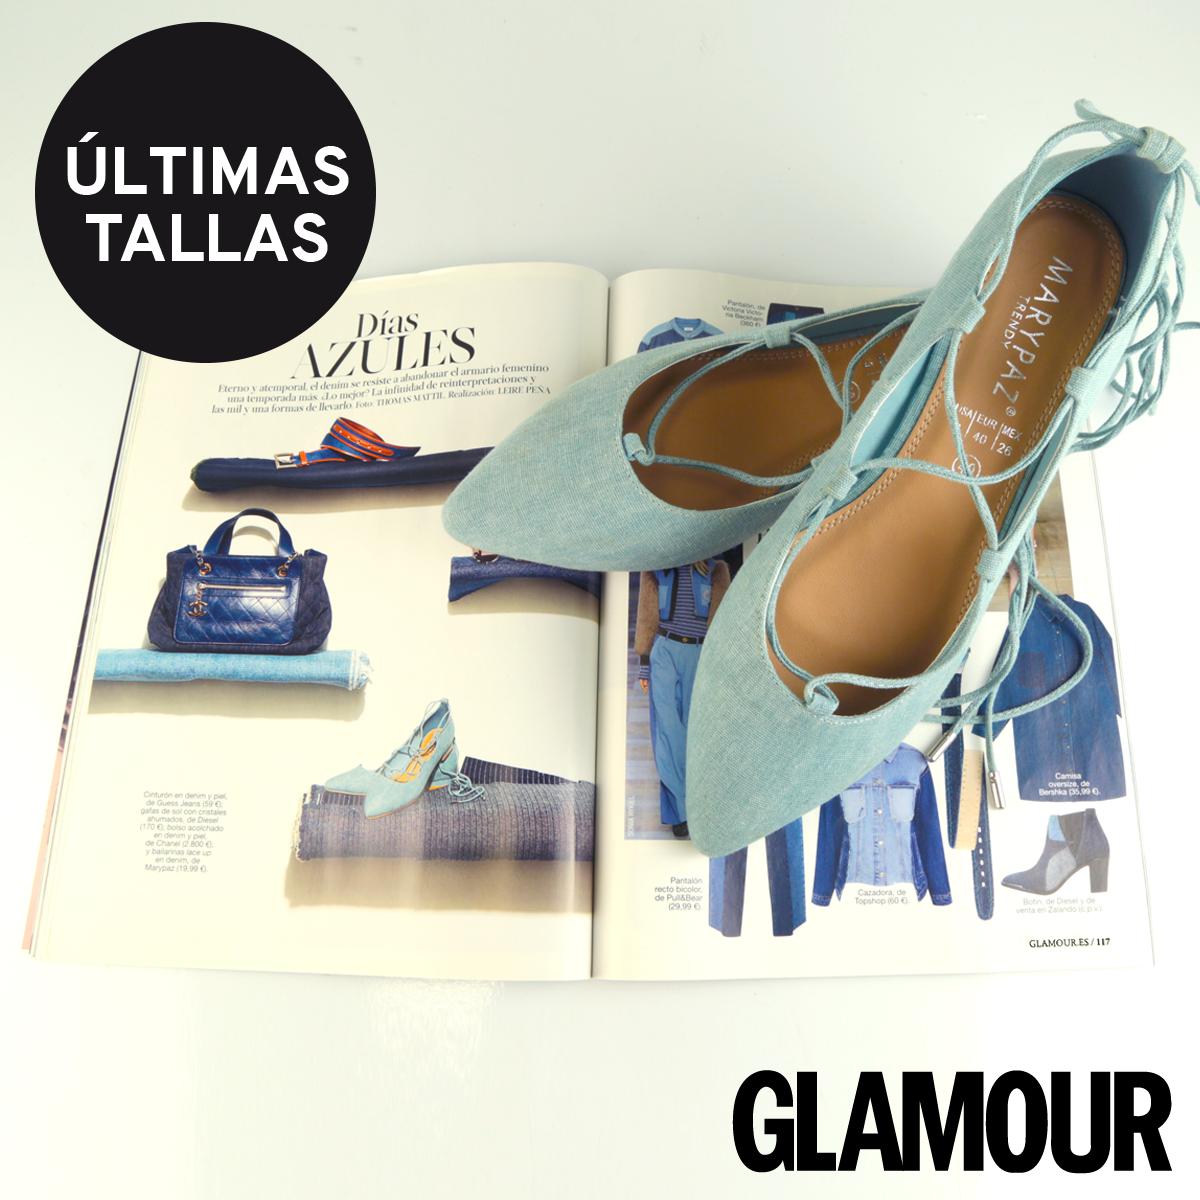 8x8_glamour